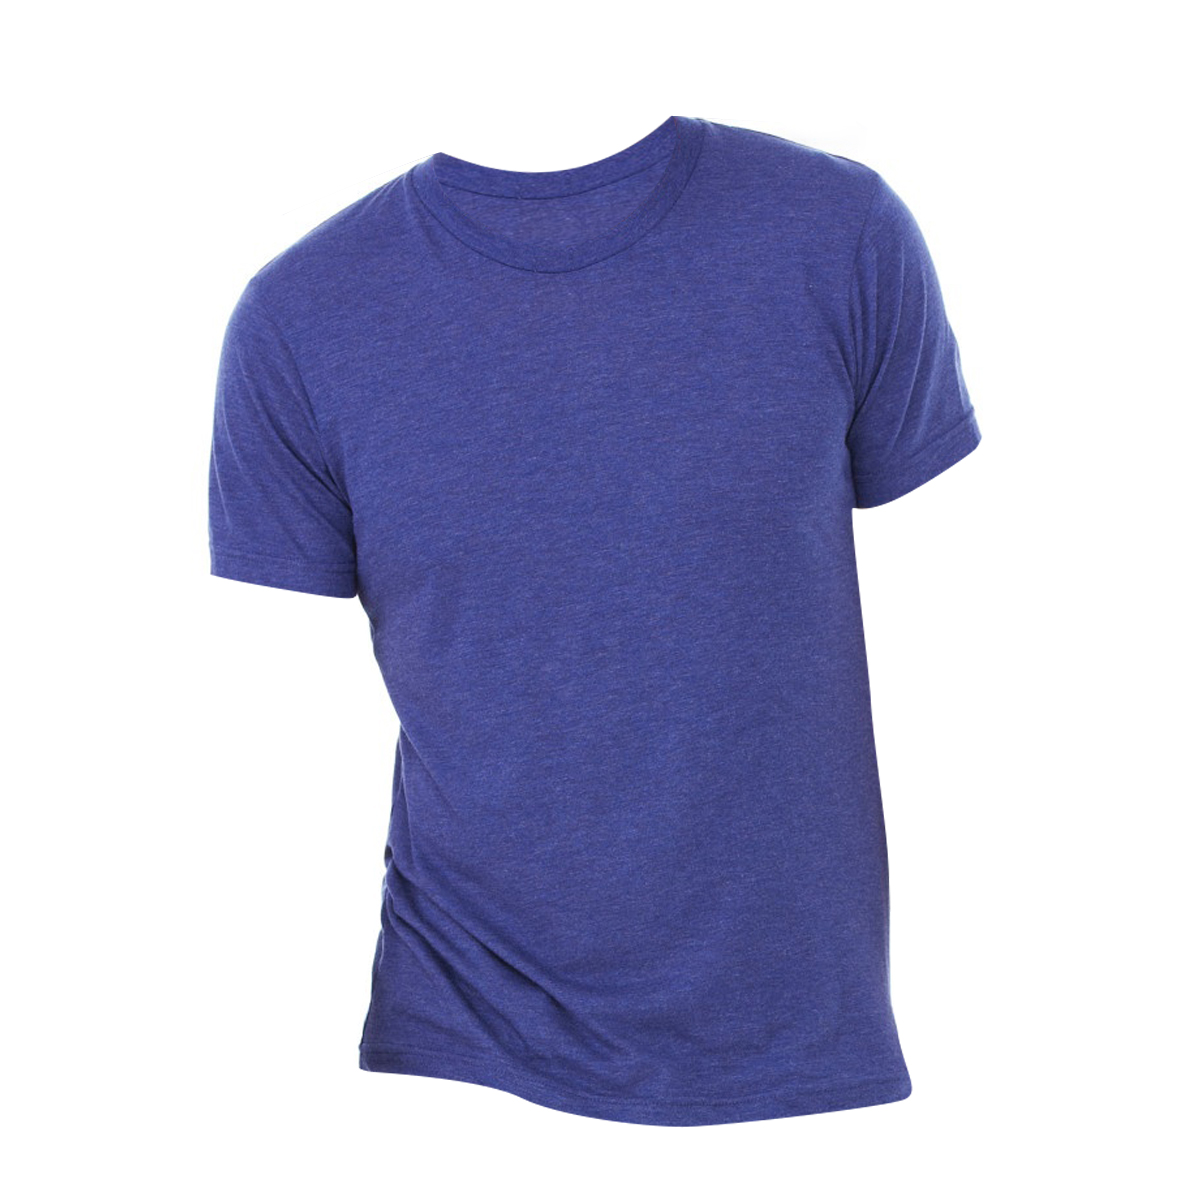 Canvas Mens Triblend Crew Neck Plain Short Sleeve T-Shirt (2XL) (Navy Triblend)